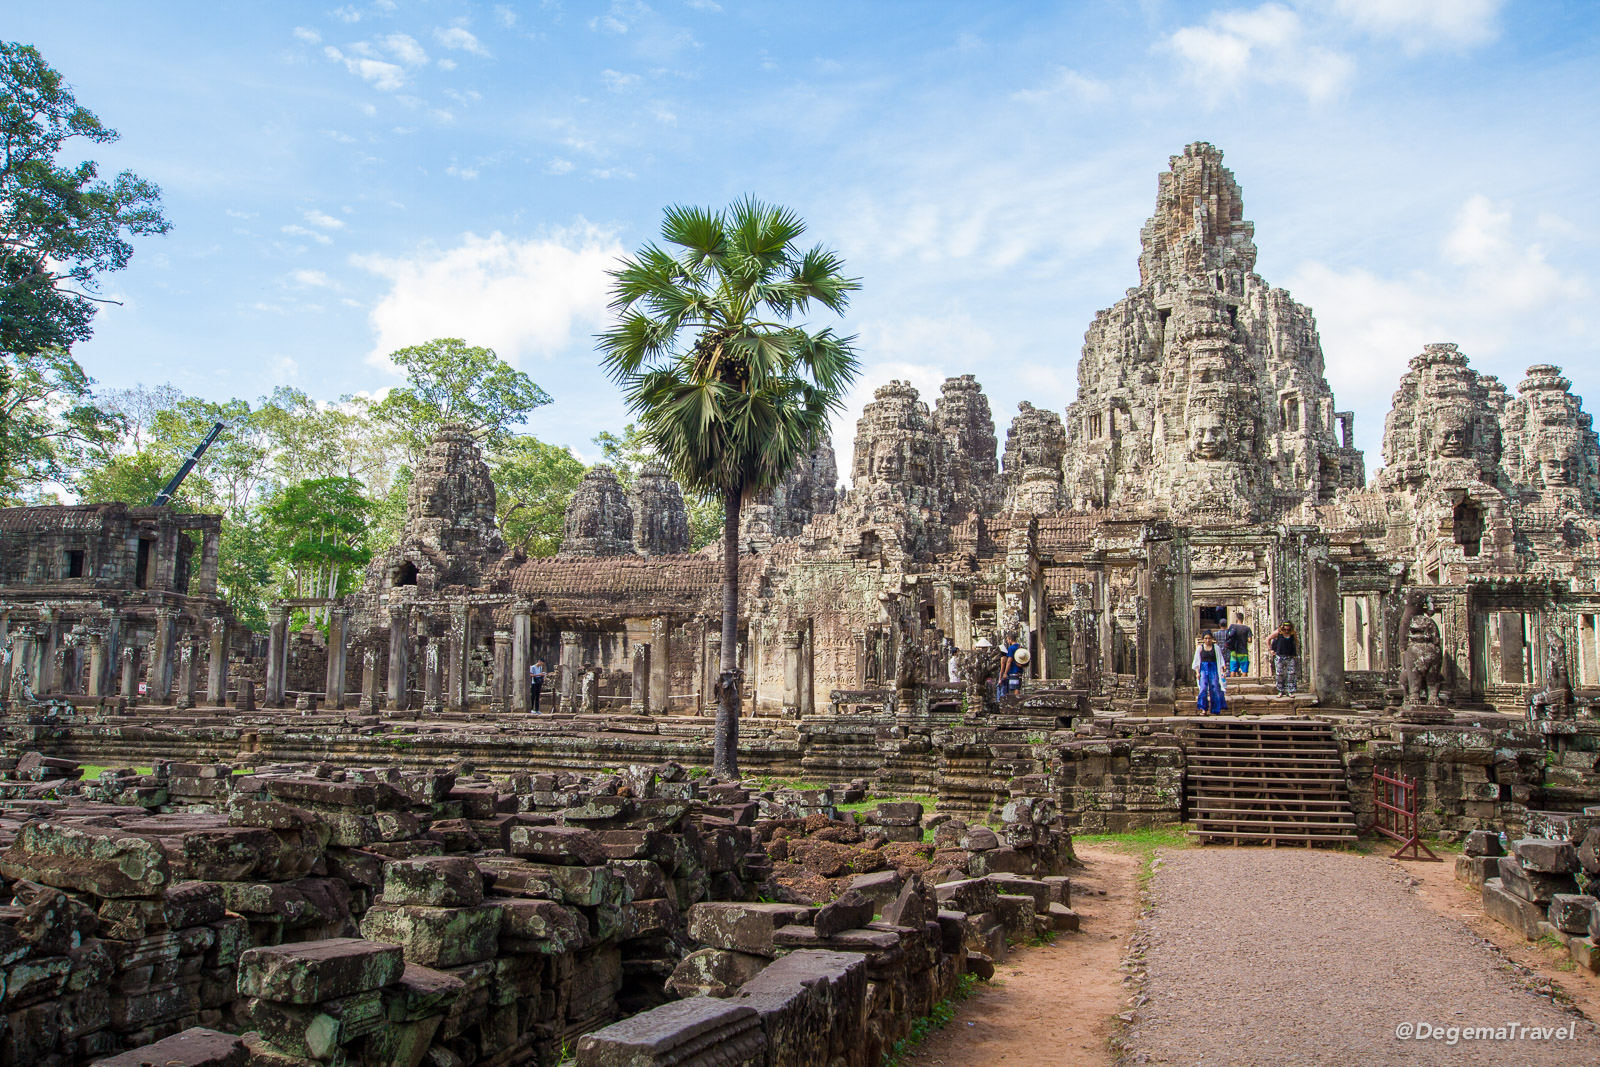 Bayon Temple near Siem Reap, Cambodia